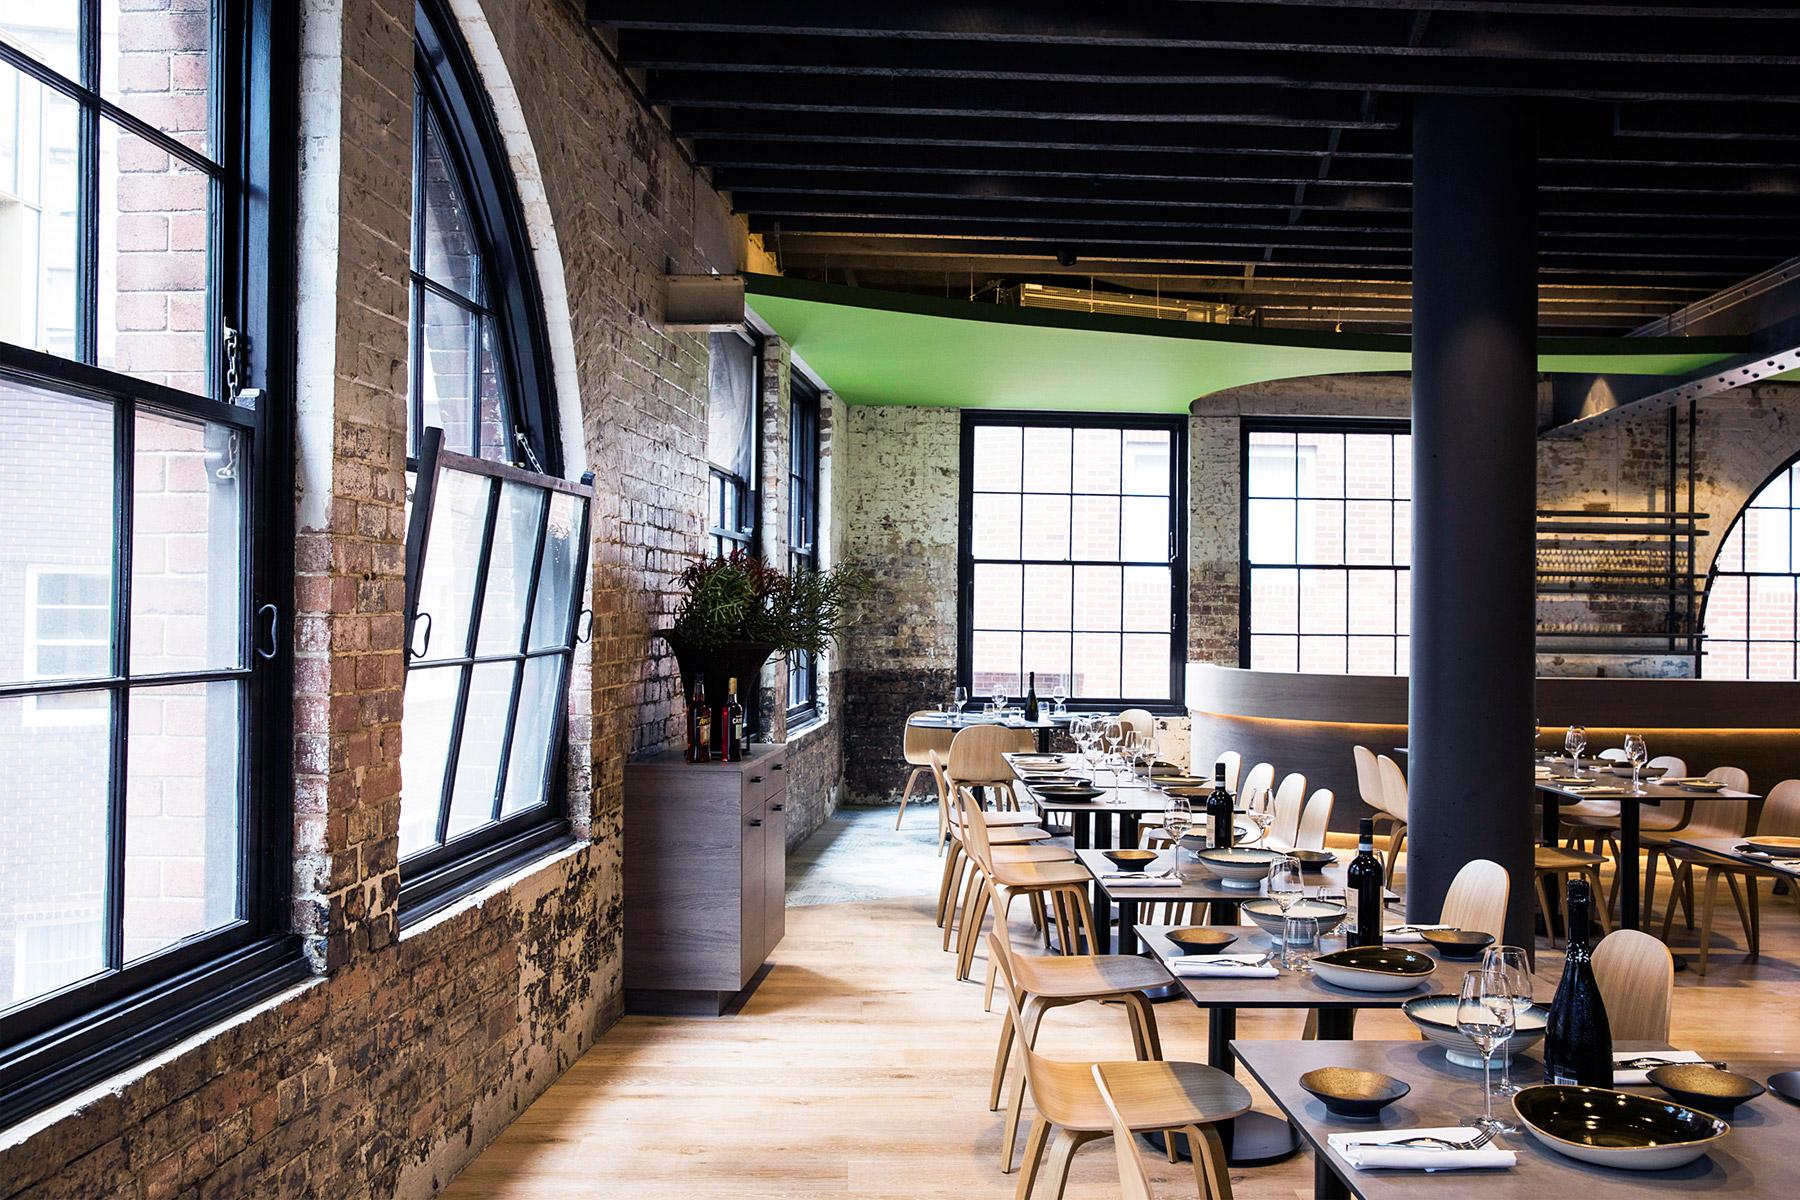 Olio Kensington Street interior